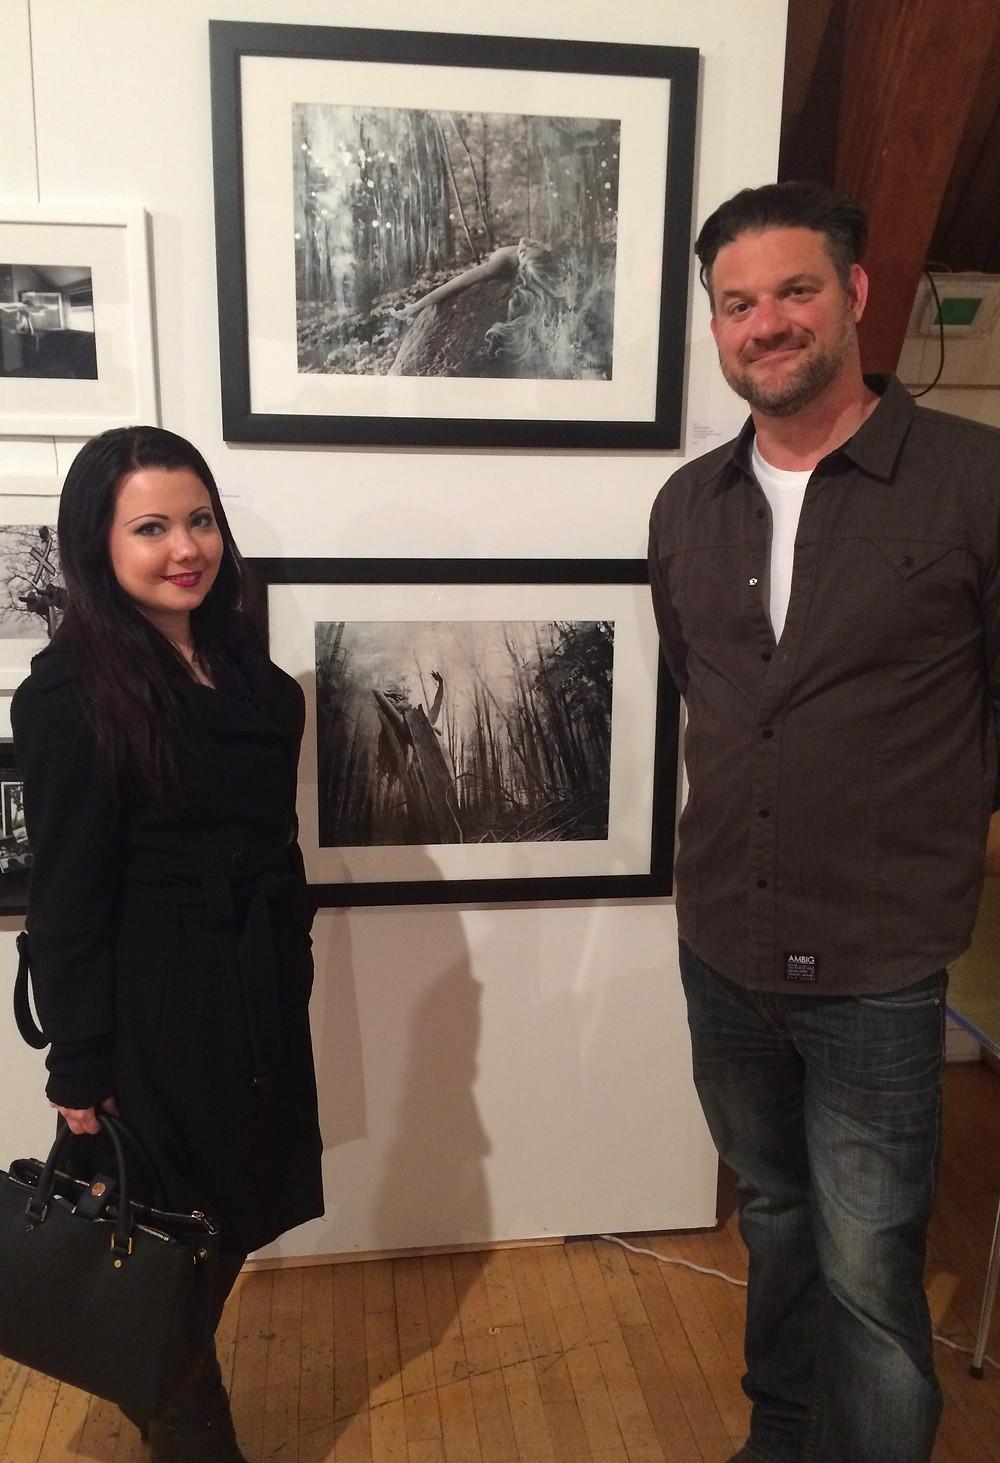 Stephen Milne and Vera Malitskaya at the Dark Room 4.0